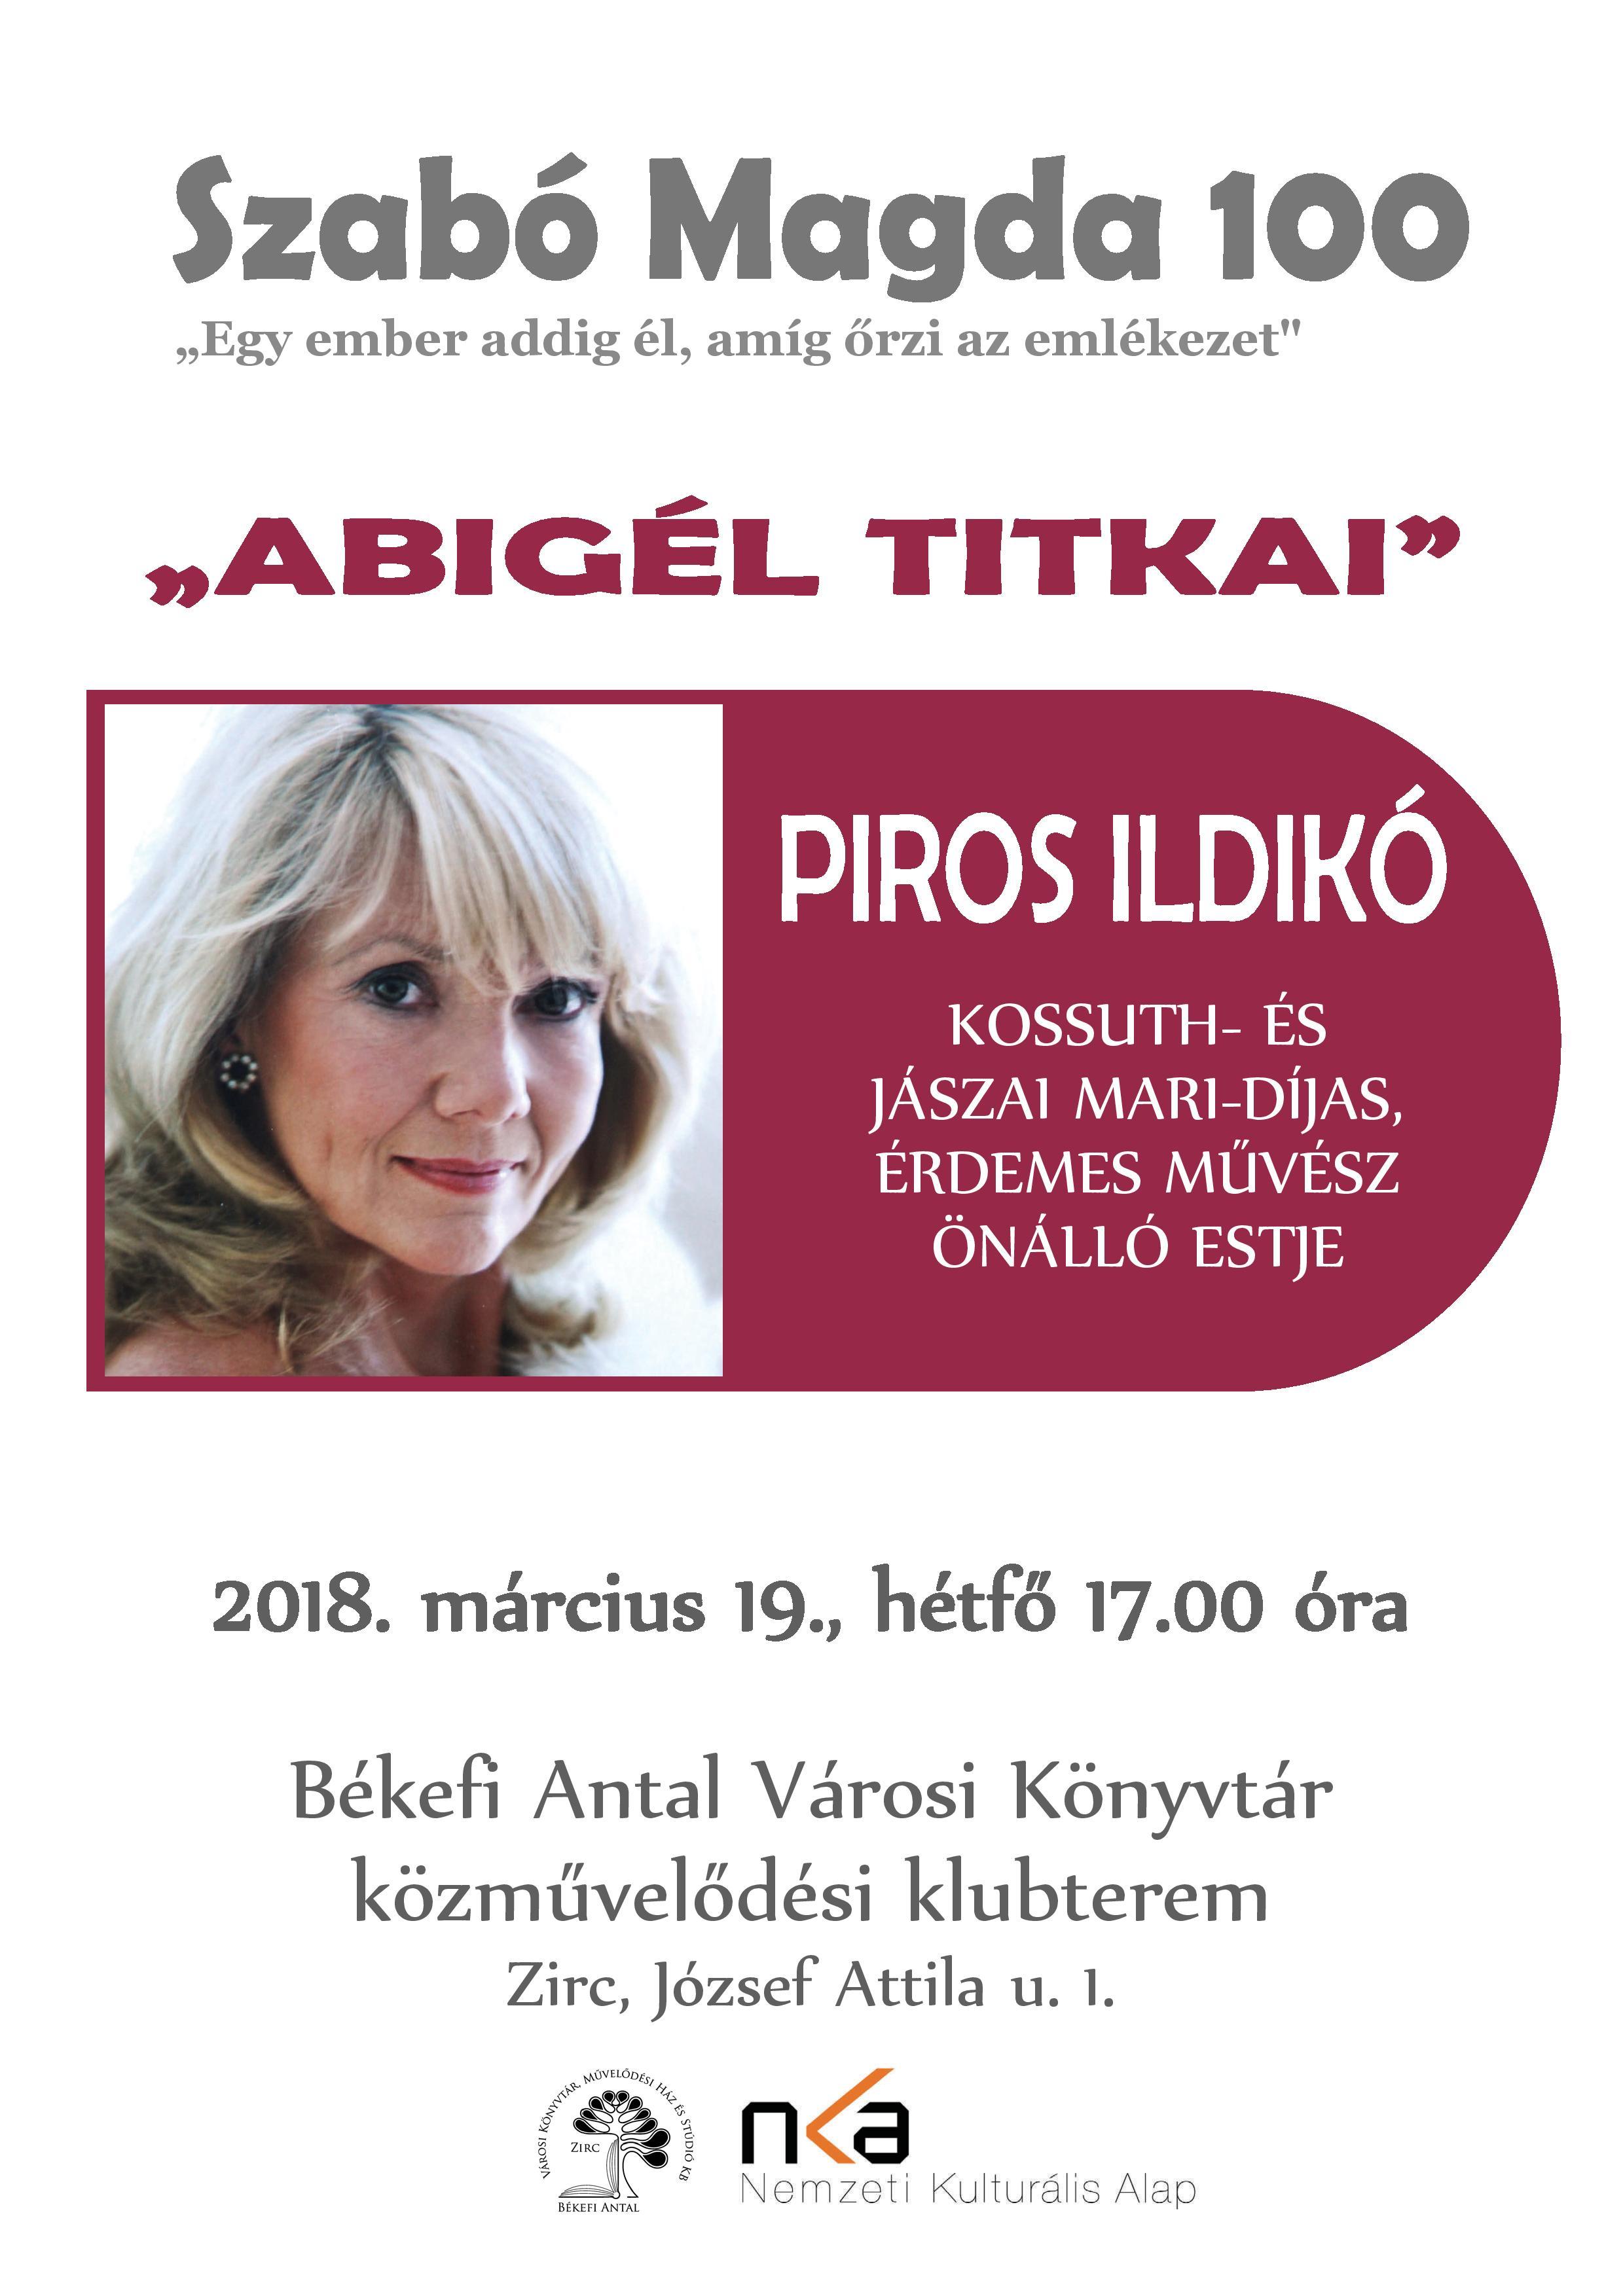 2018-03-19_piros_ildiko-abigel_titkai1-page-001.jpg